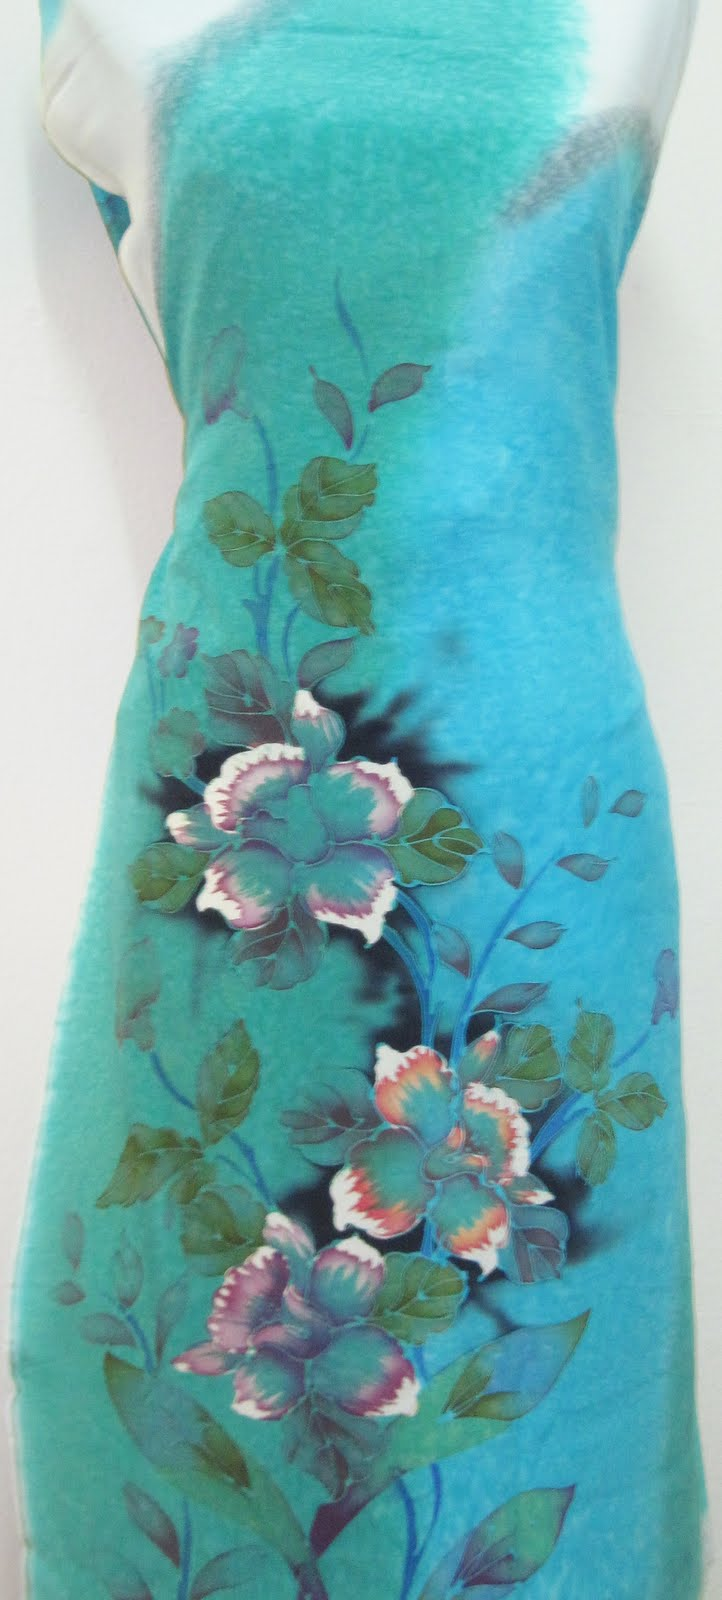 Pin Batik Sutera Crepe Abstrak Silky Terengganu on Pinterest